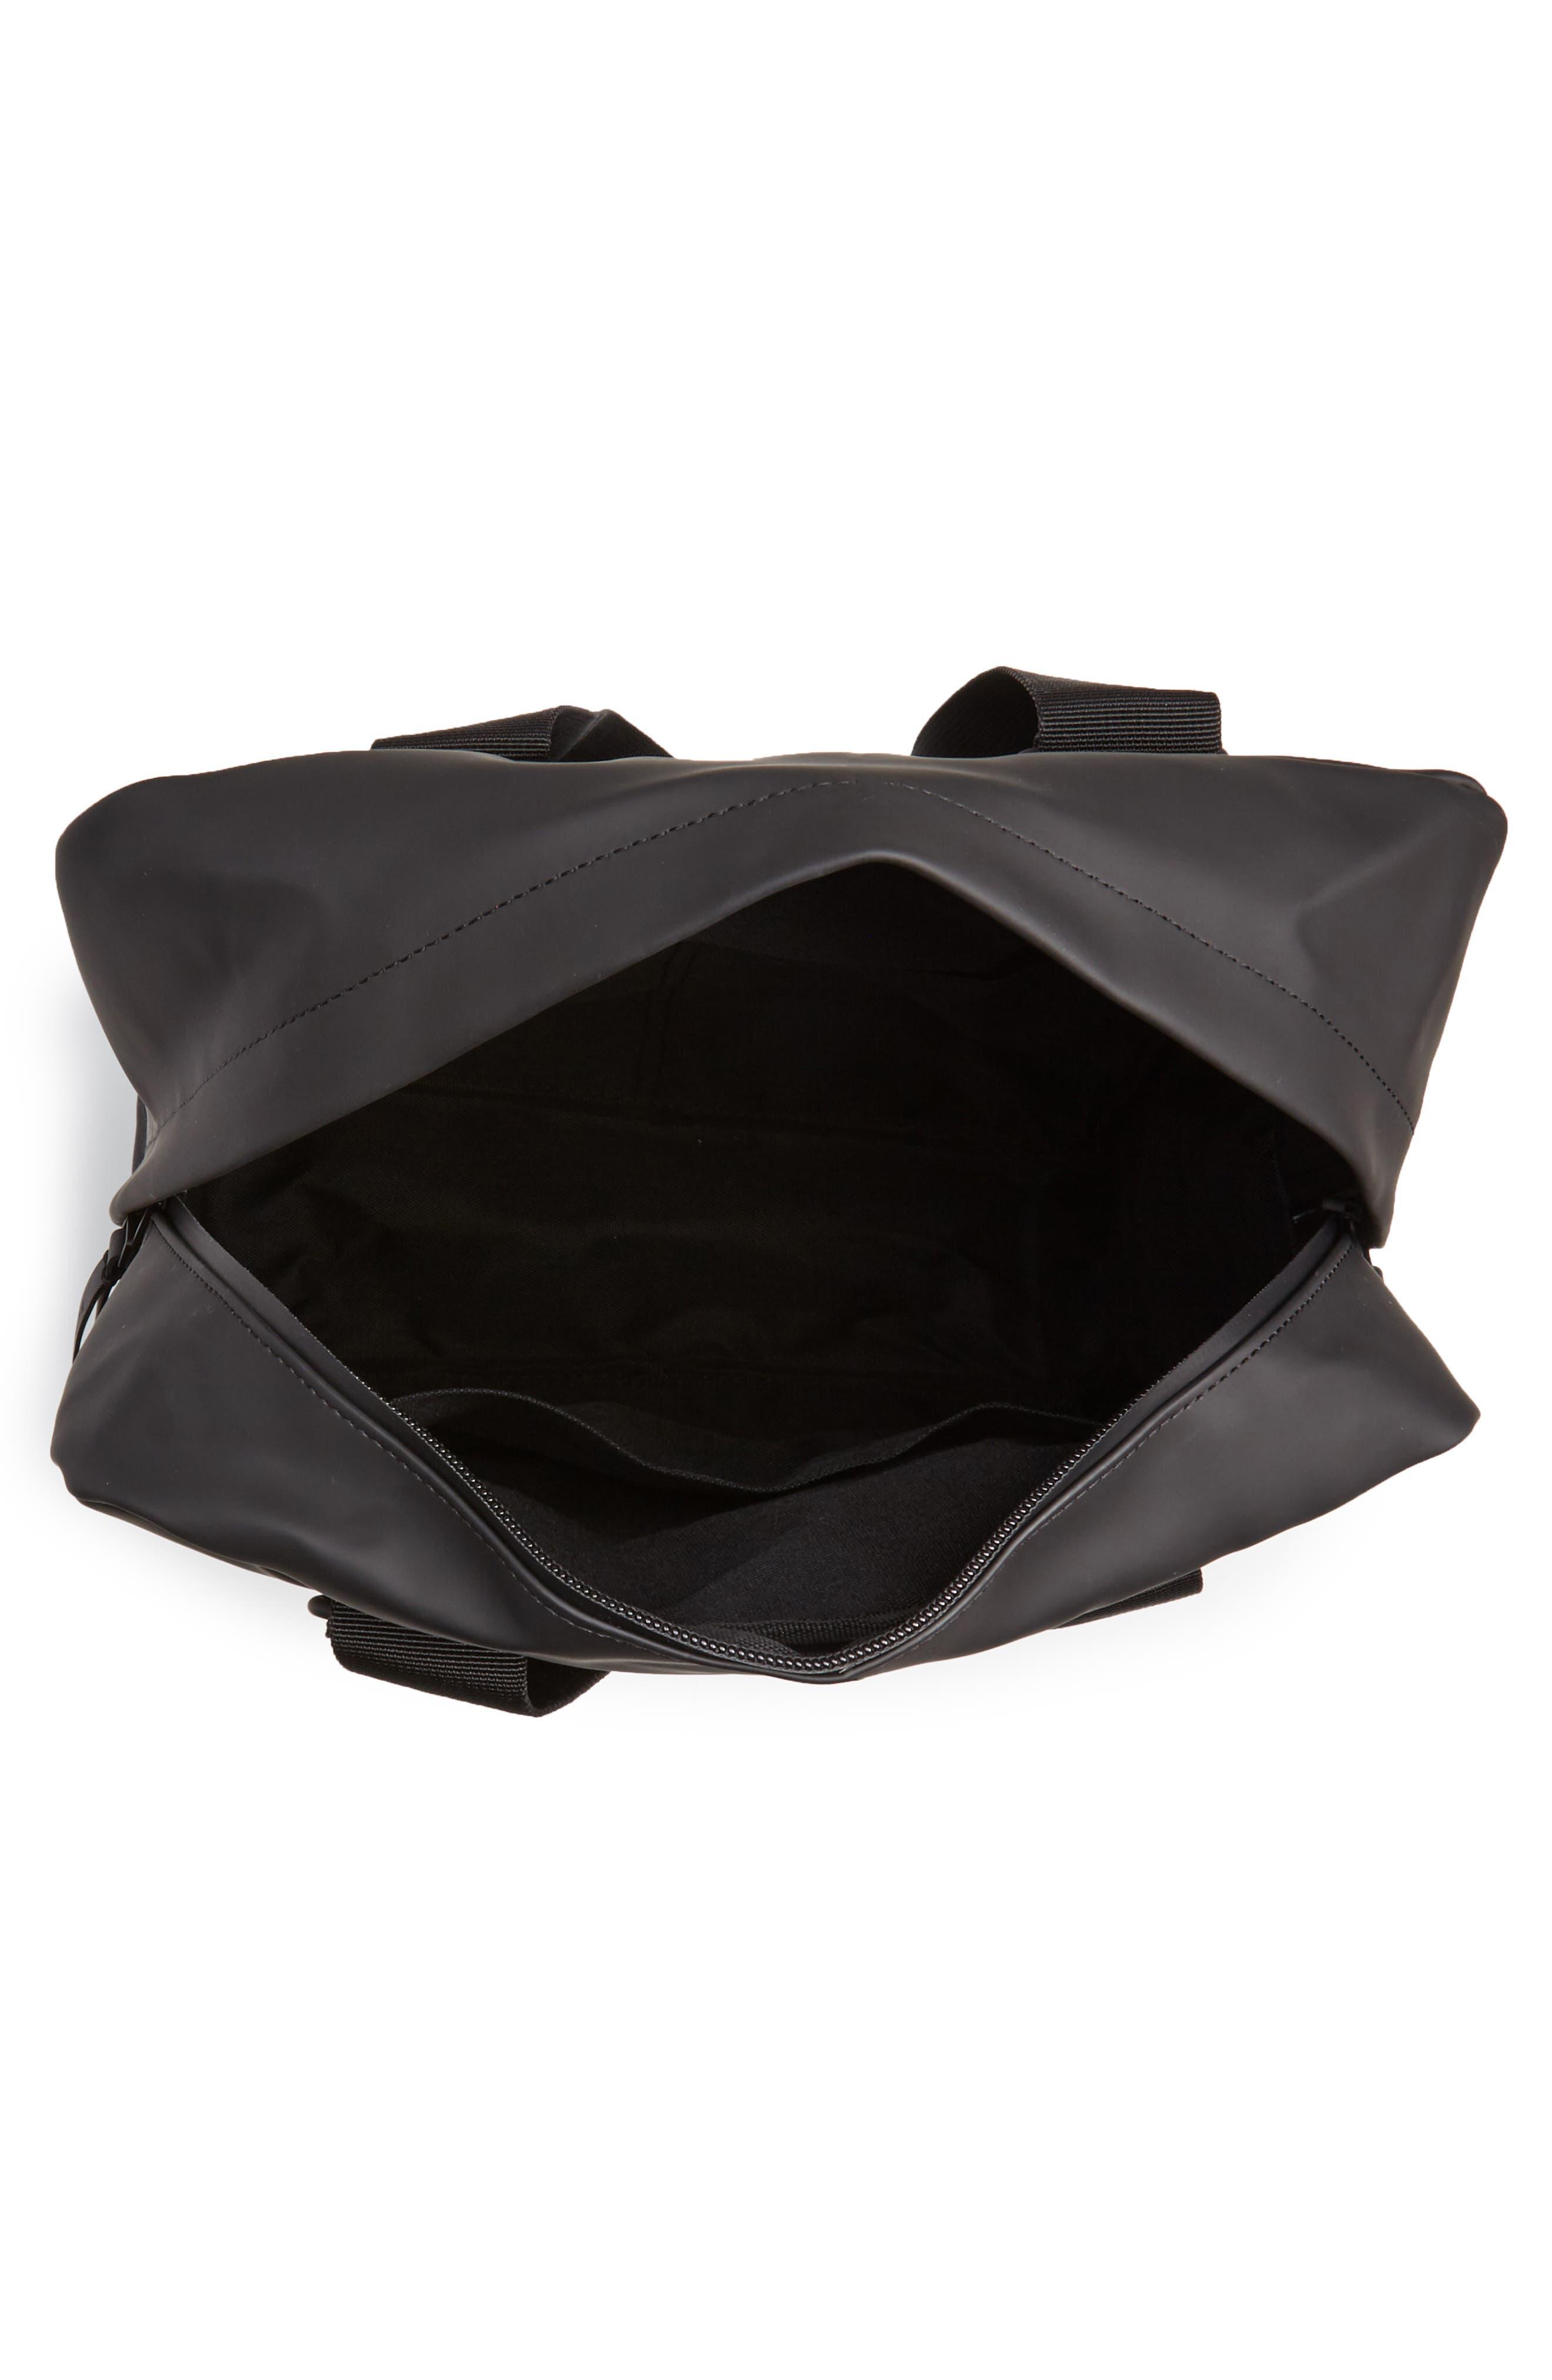 Waterproof Utility Tote Bag,                             Alternate thumbnail 4, color,                             BLACK